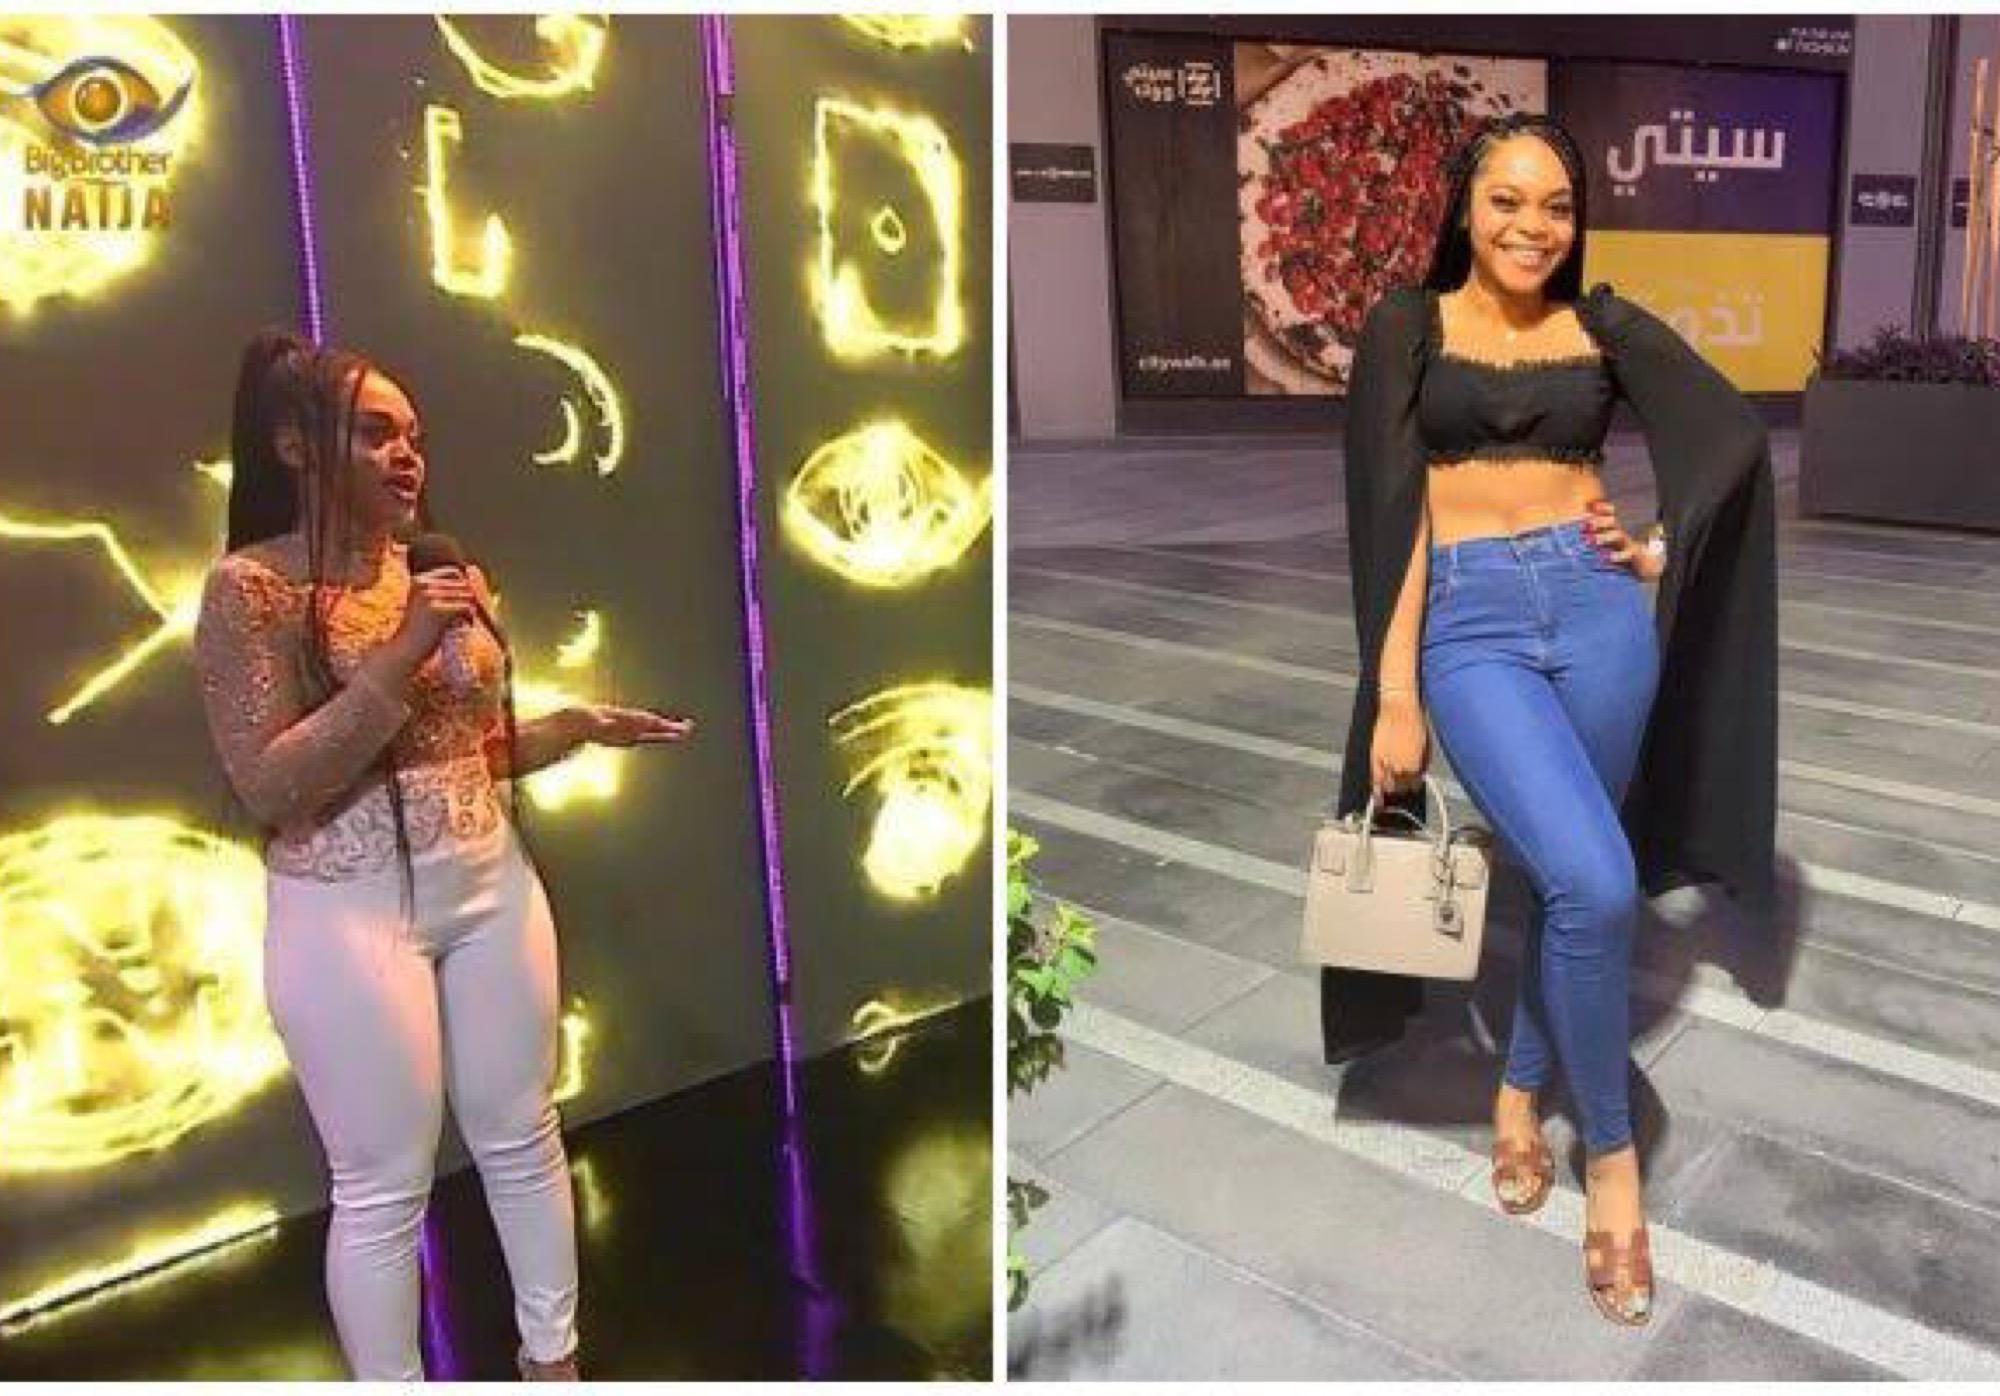 'Enough With The Beauty Comparism' - BBNaija's Lilo Tells Fans